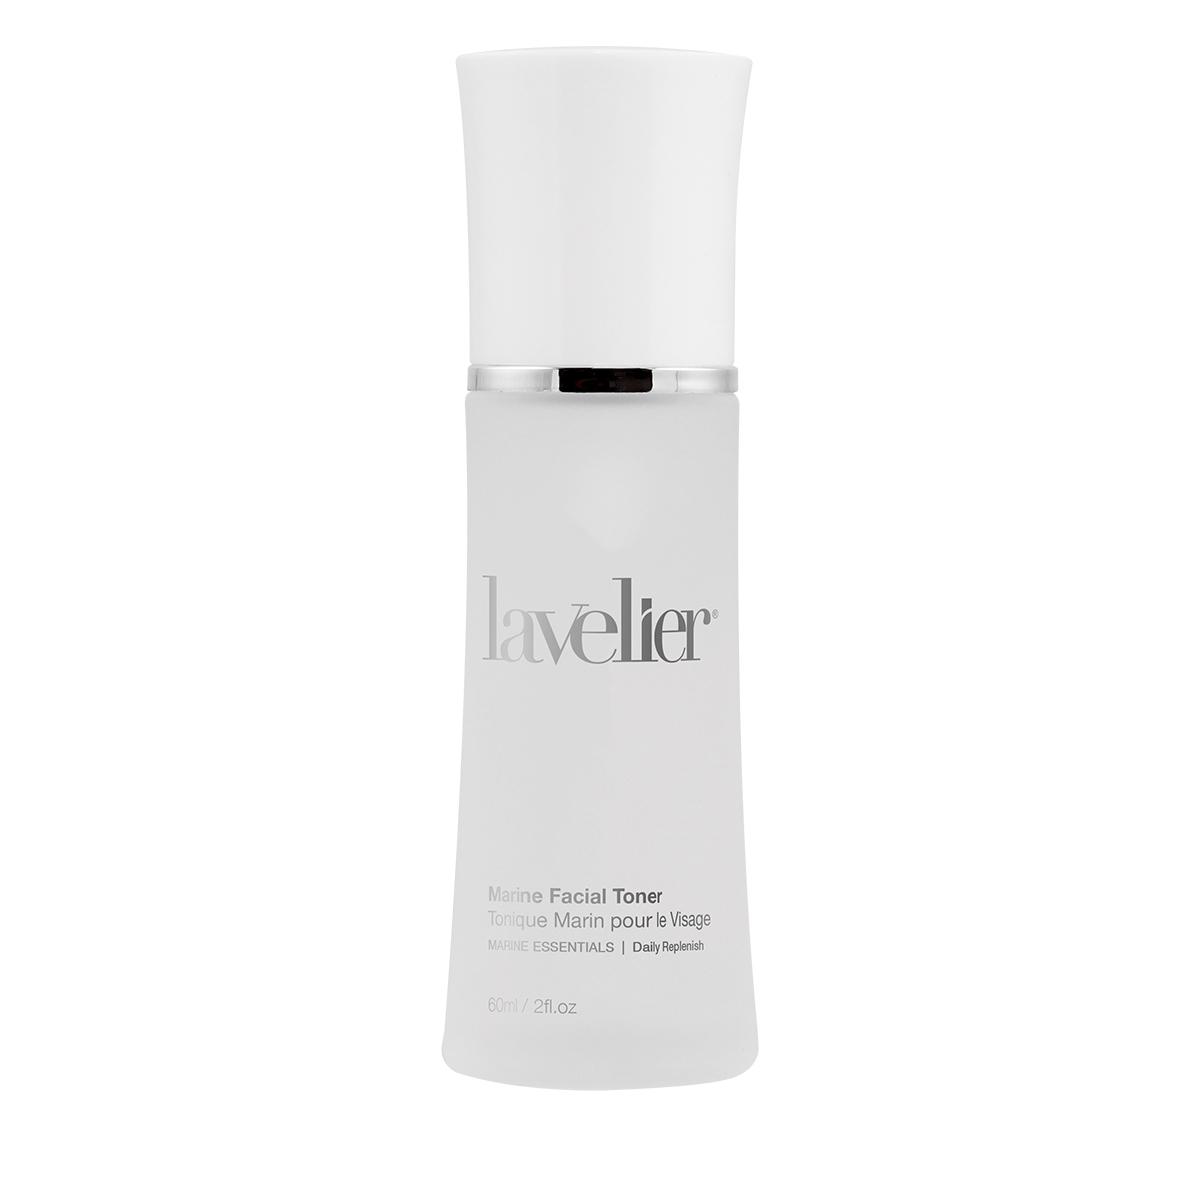 Lavelier Marine Essentails Facial Toner Bottle Front